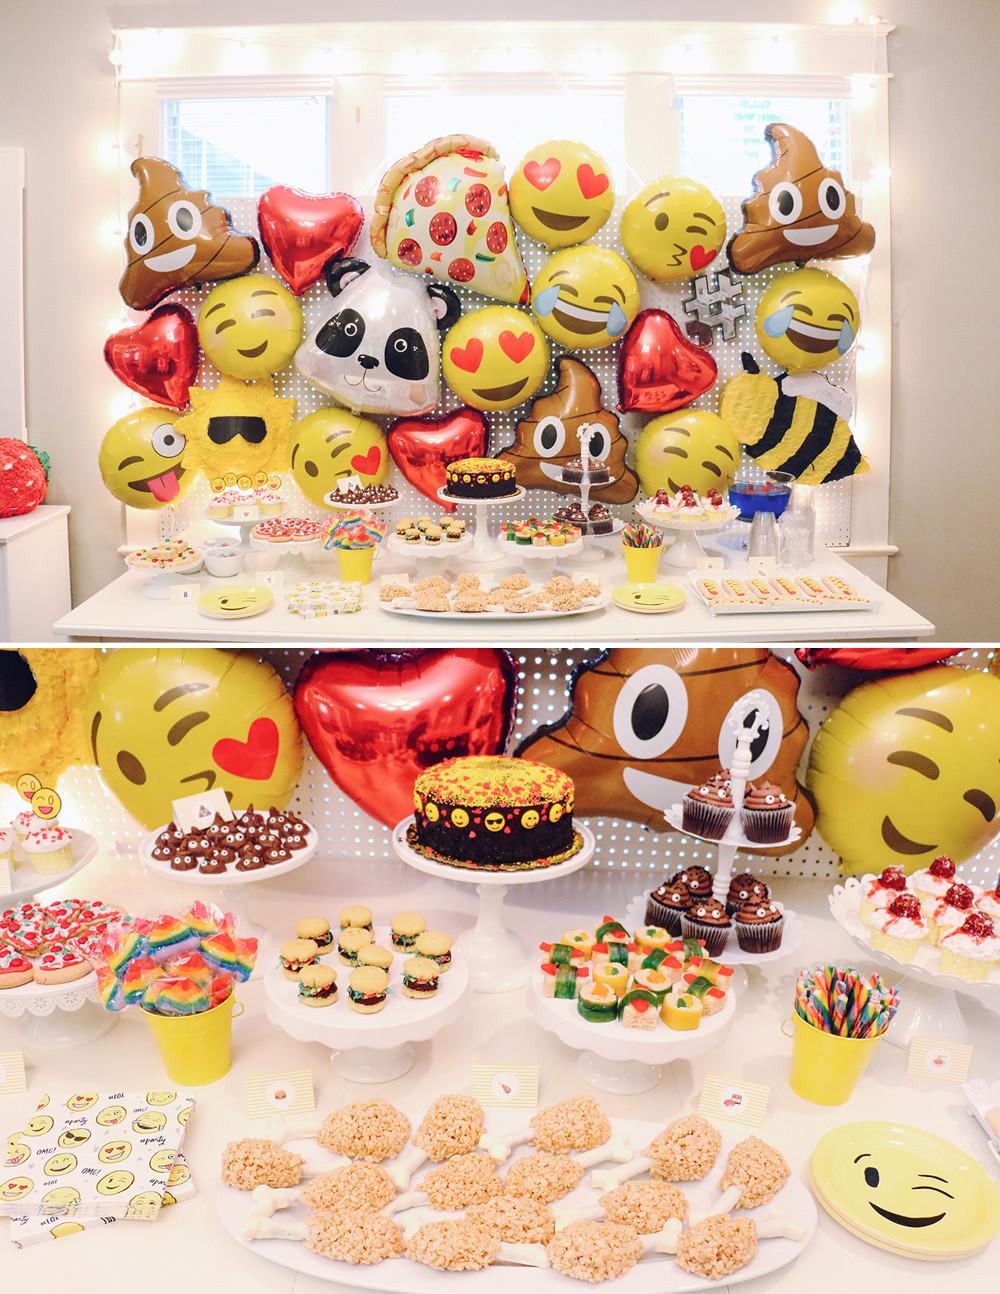 Emoji Birthday Decorations  Sophia's Emoji Birthday Party – At Home With Natalie